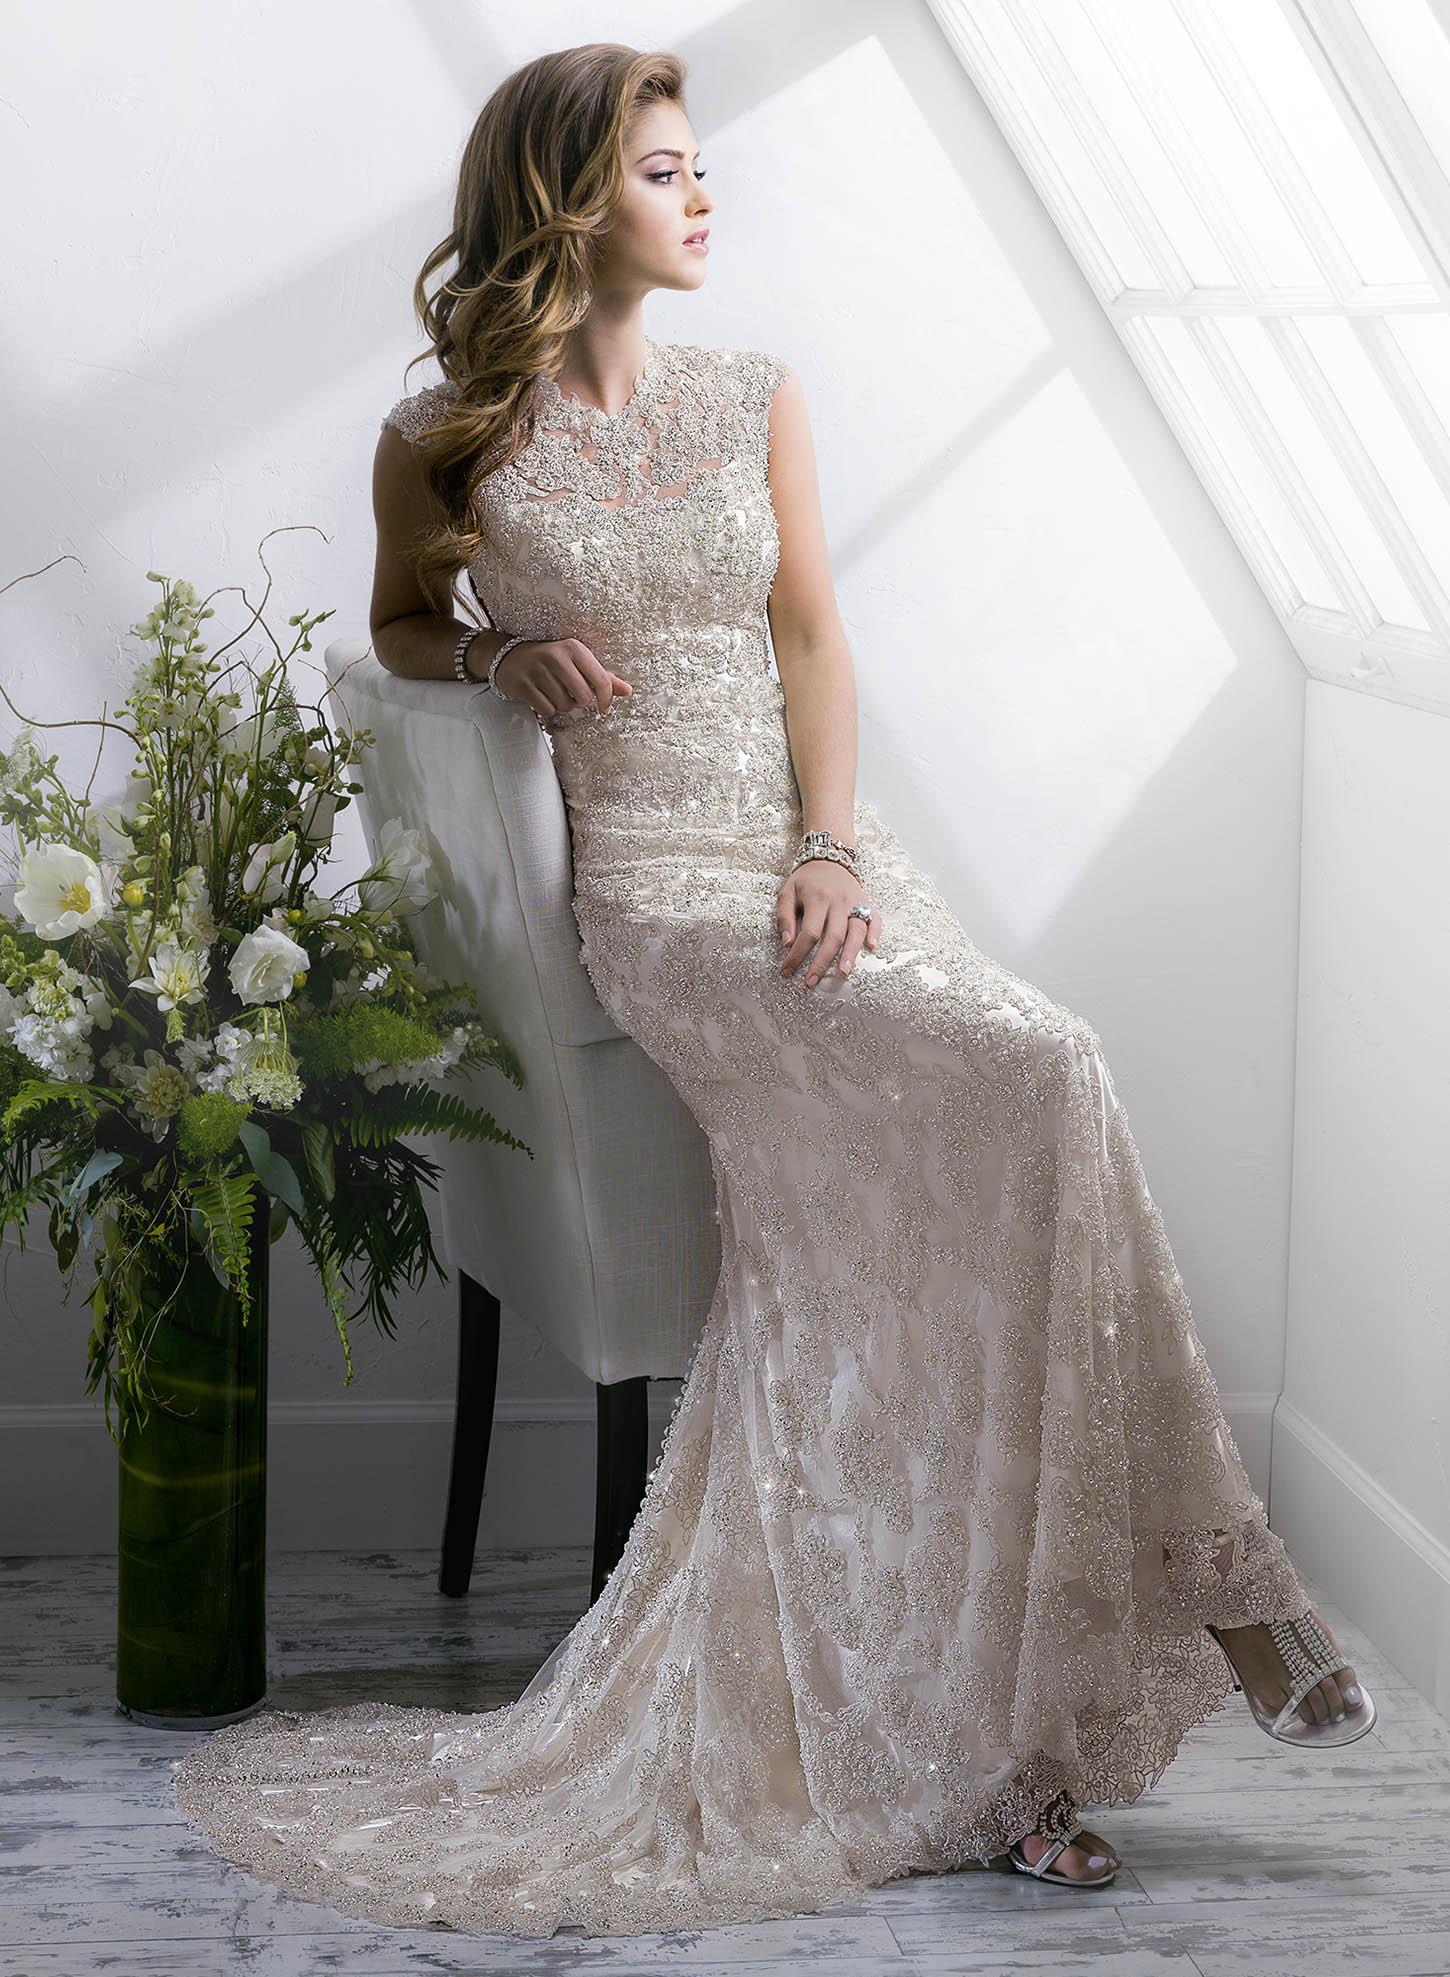 10 Breathtaking Designer Wedding Dresses Bestbride101